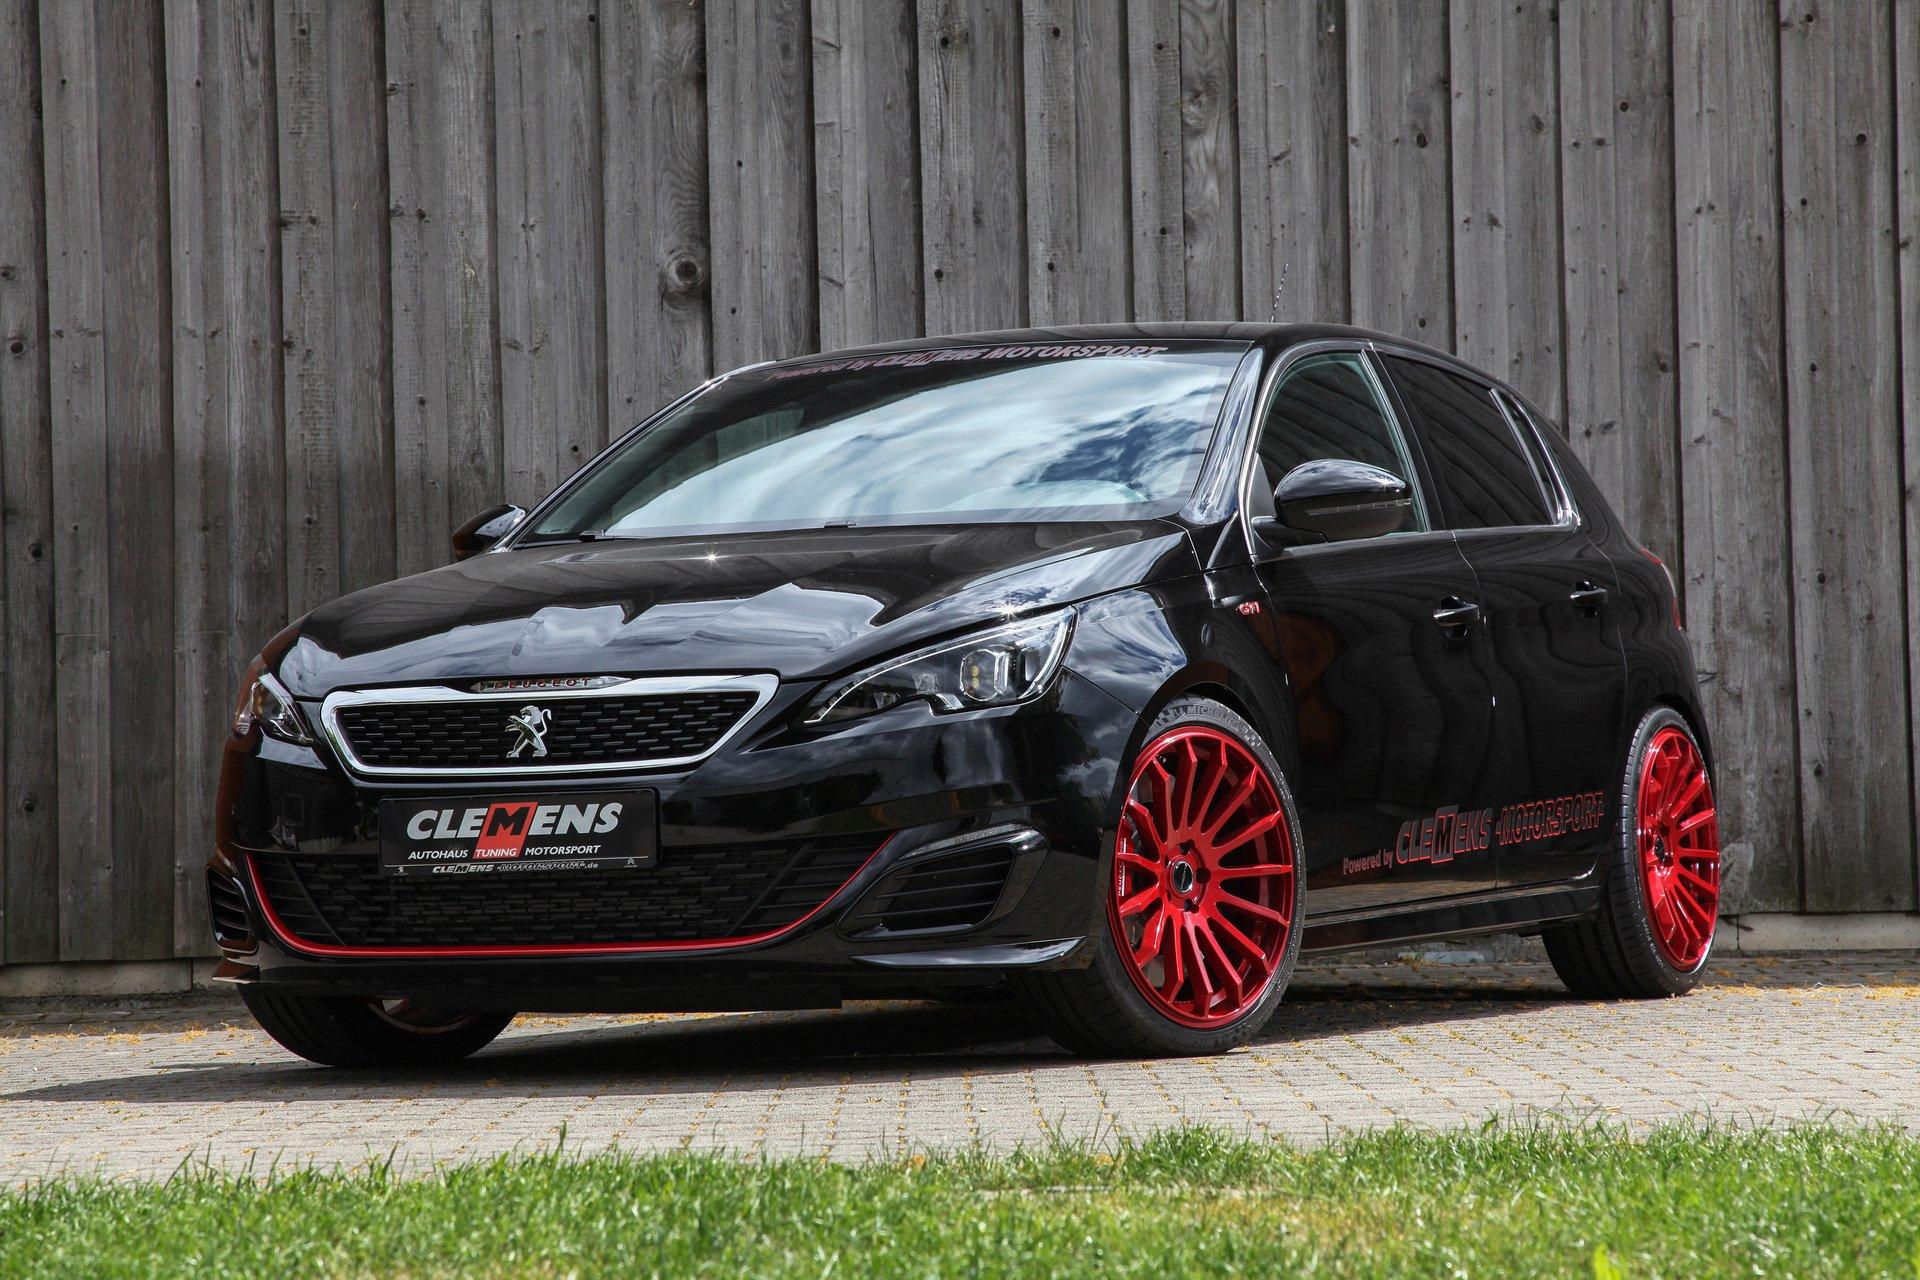 Peugeot_308_GTi_by_Clemens_Motorsport_0005